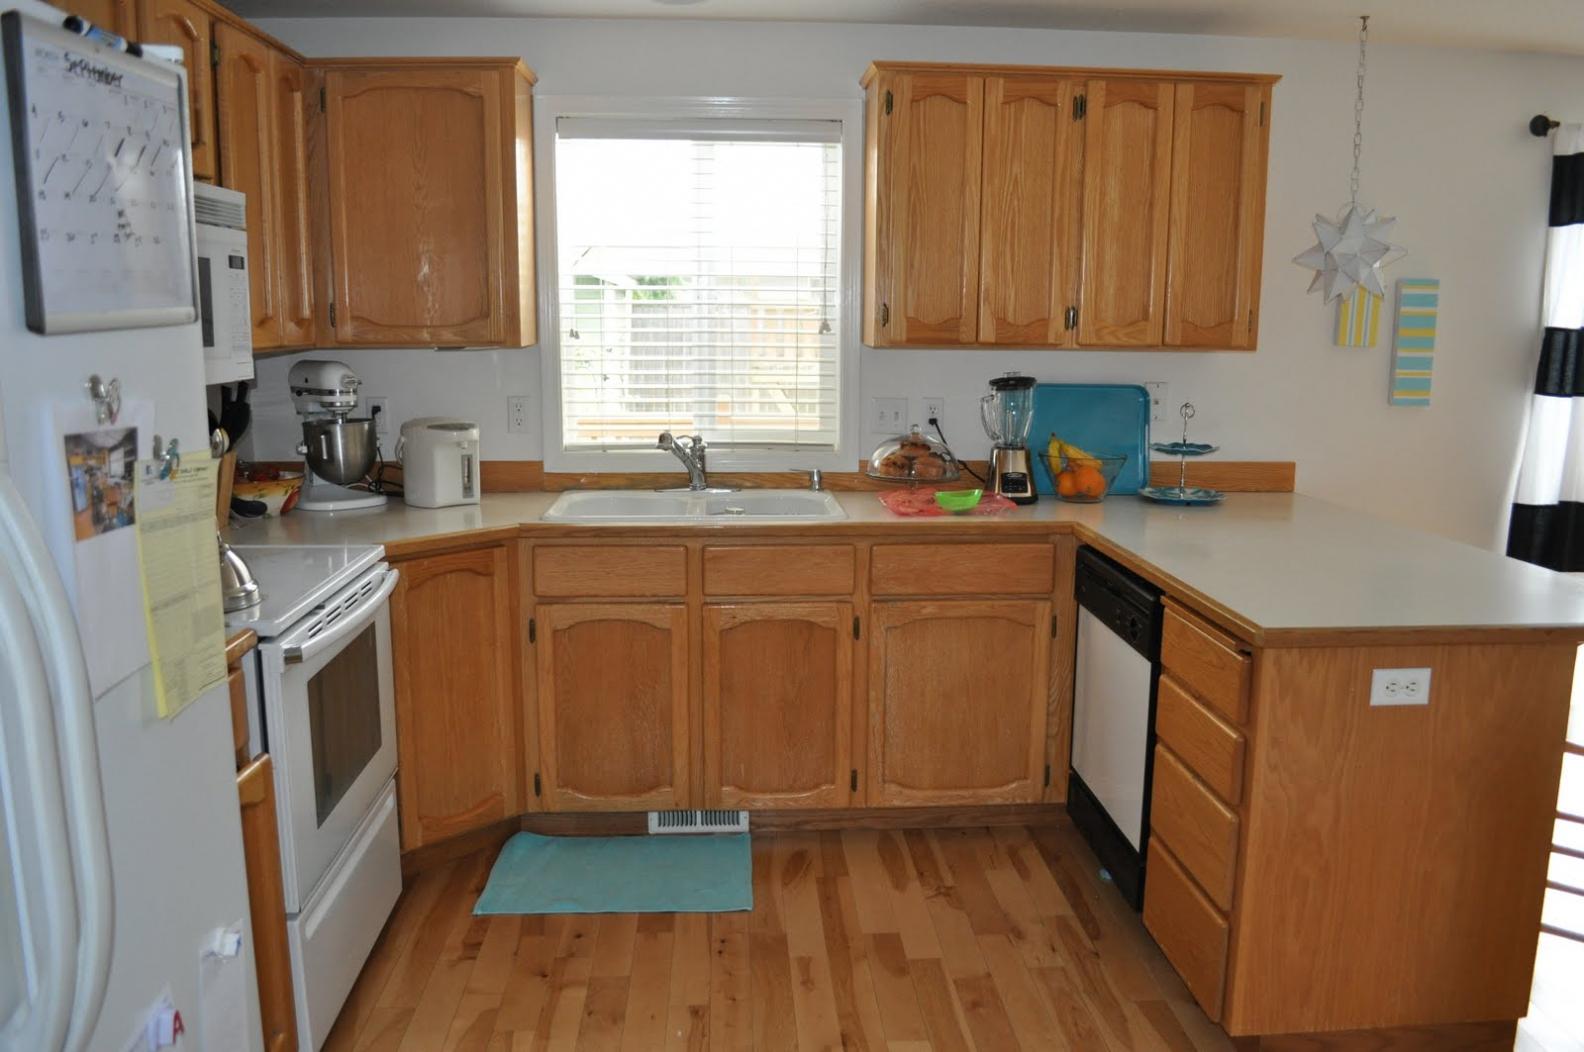 u shaped kitchen cabinet ideas photo - 4